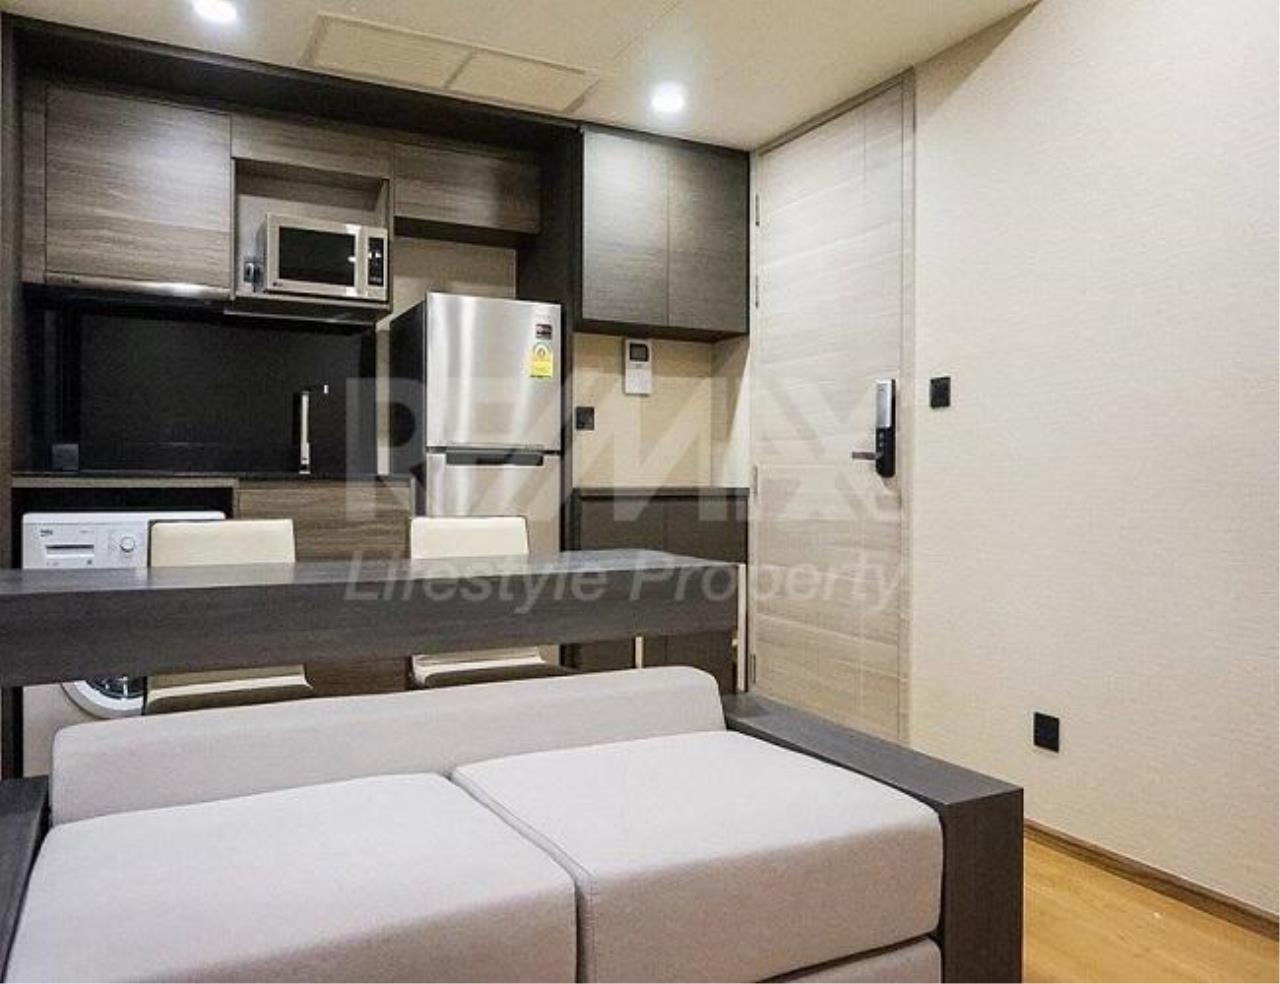 RE/MAX LifeStyle Property Agency's Klass Condo Langsuan 1